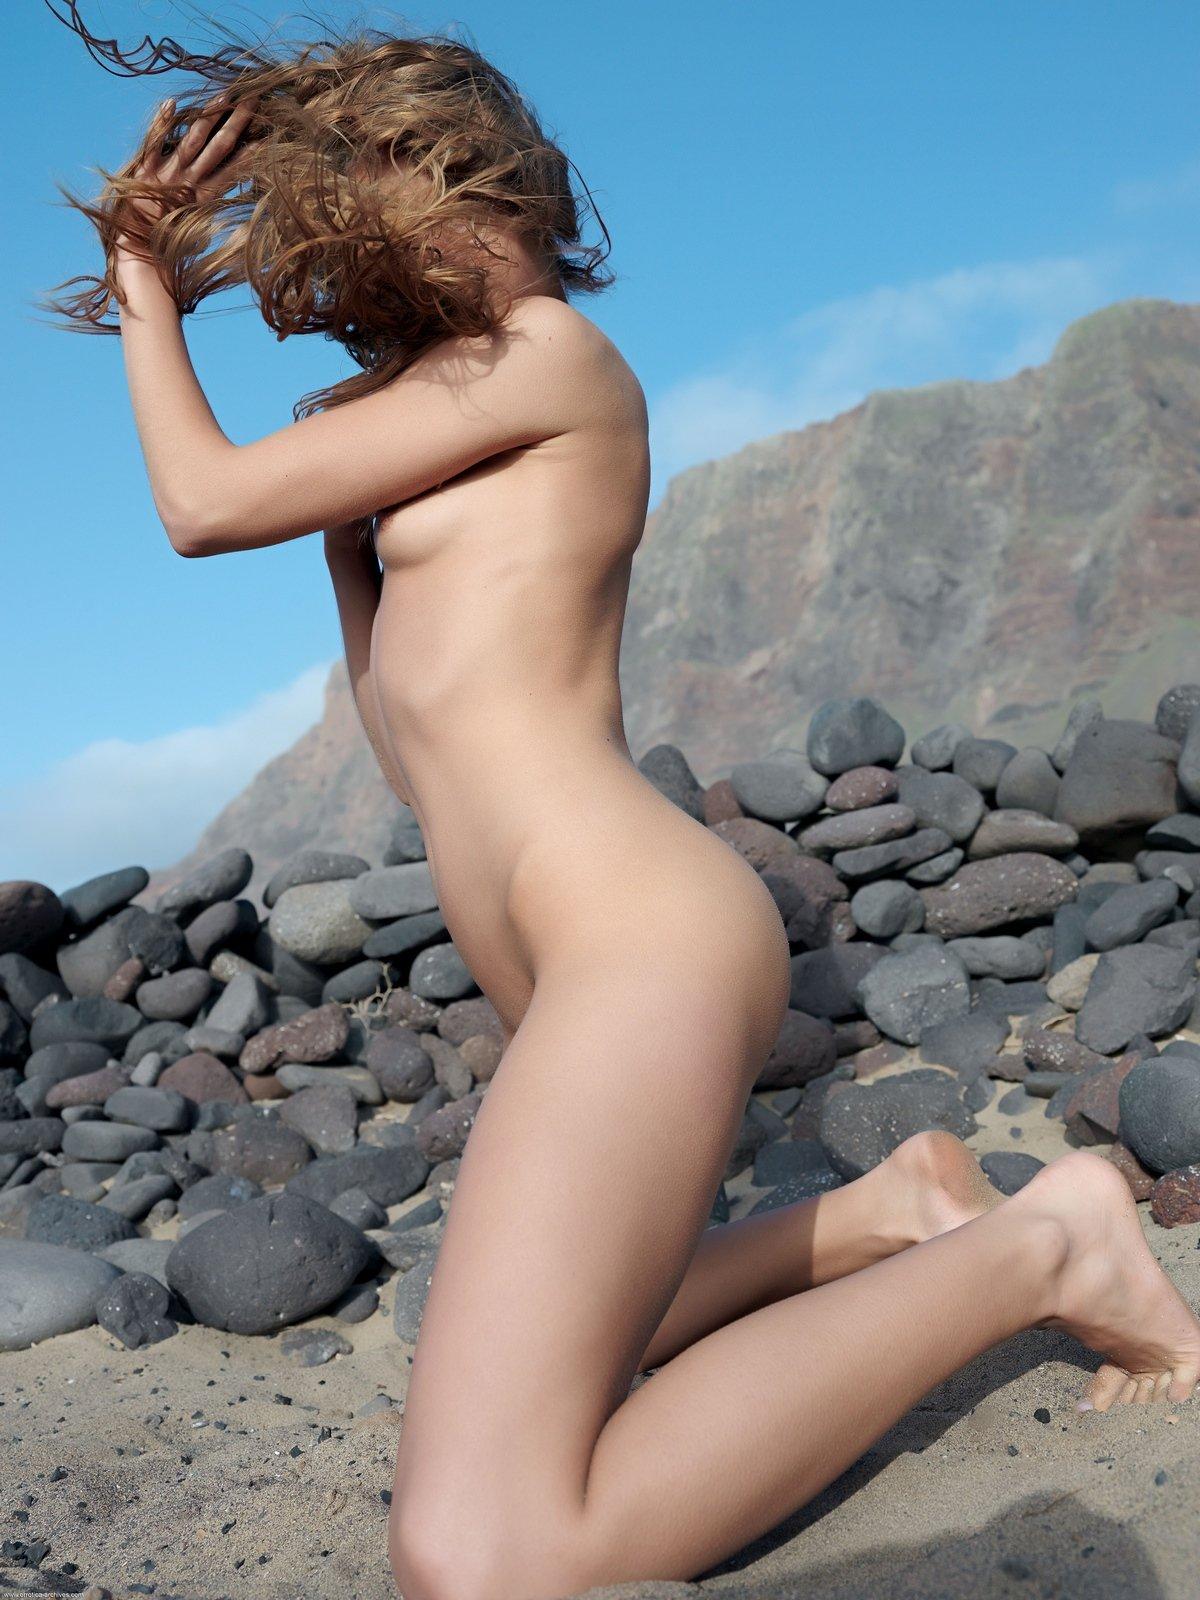 Сучка на камнях нагая на свежем воздухе